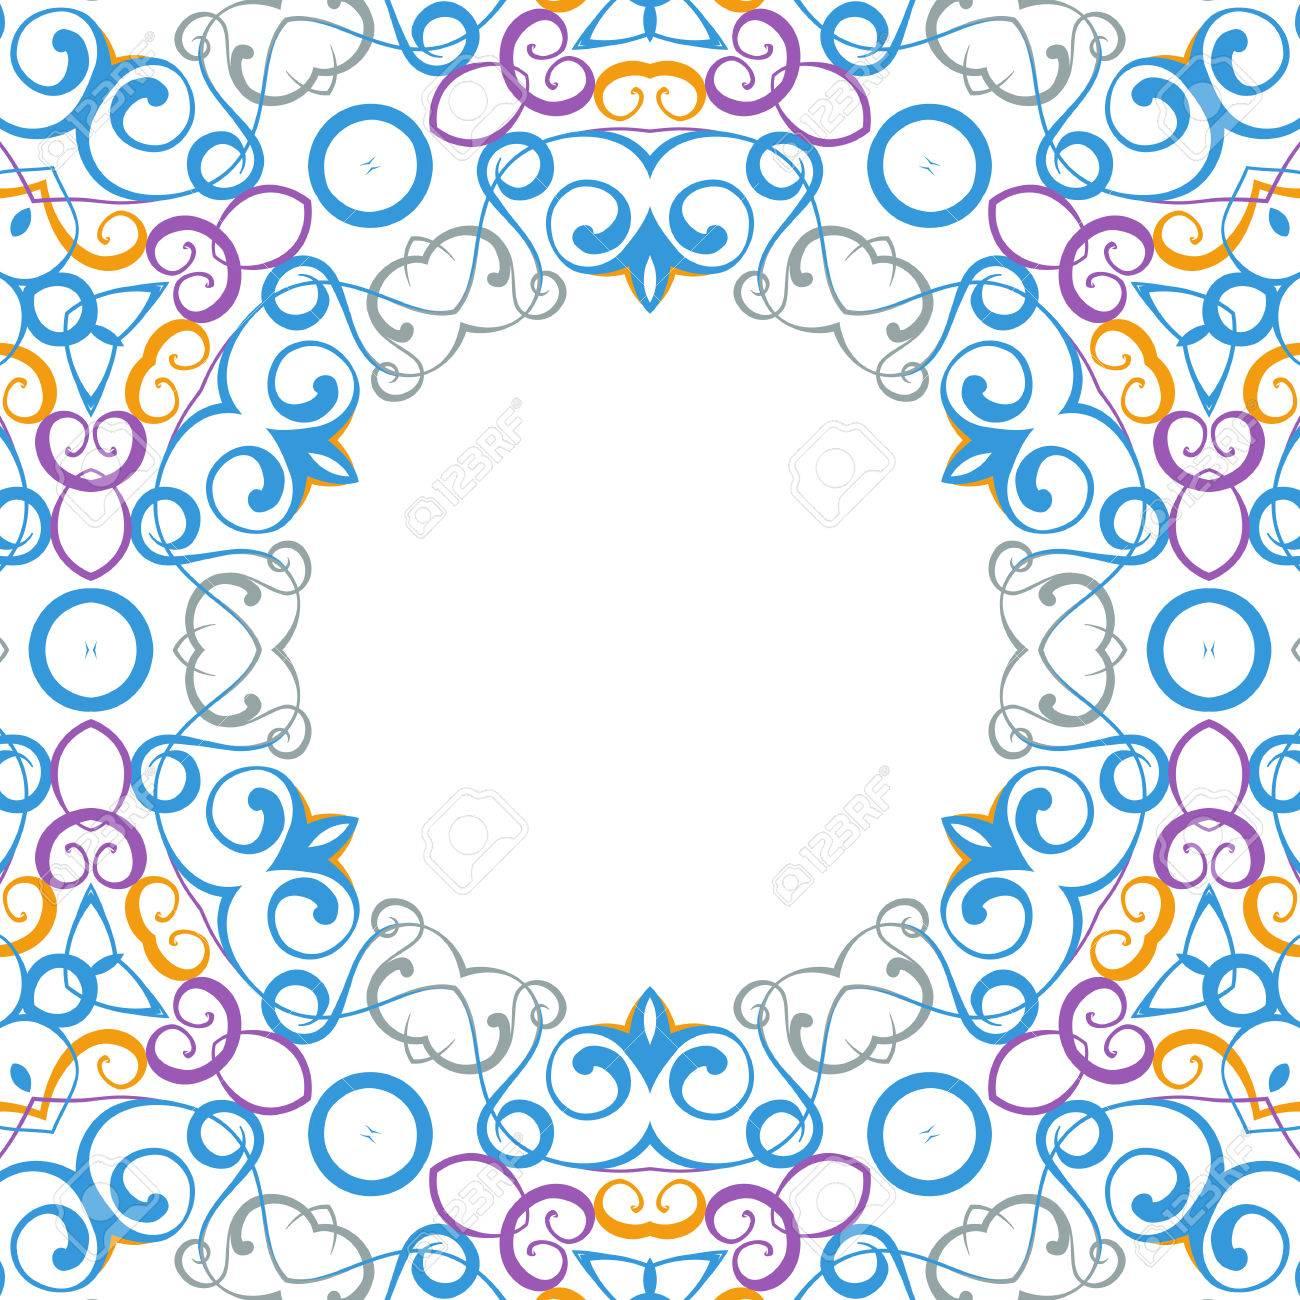 Formality circular devices of border frames. Vector illustration. Stock Vector - 23079468